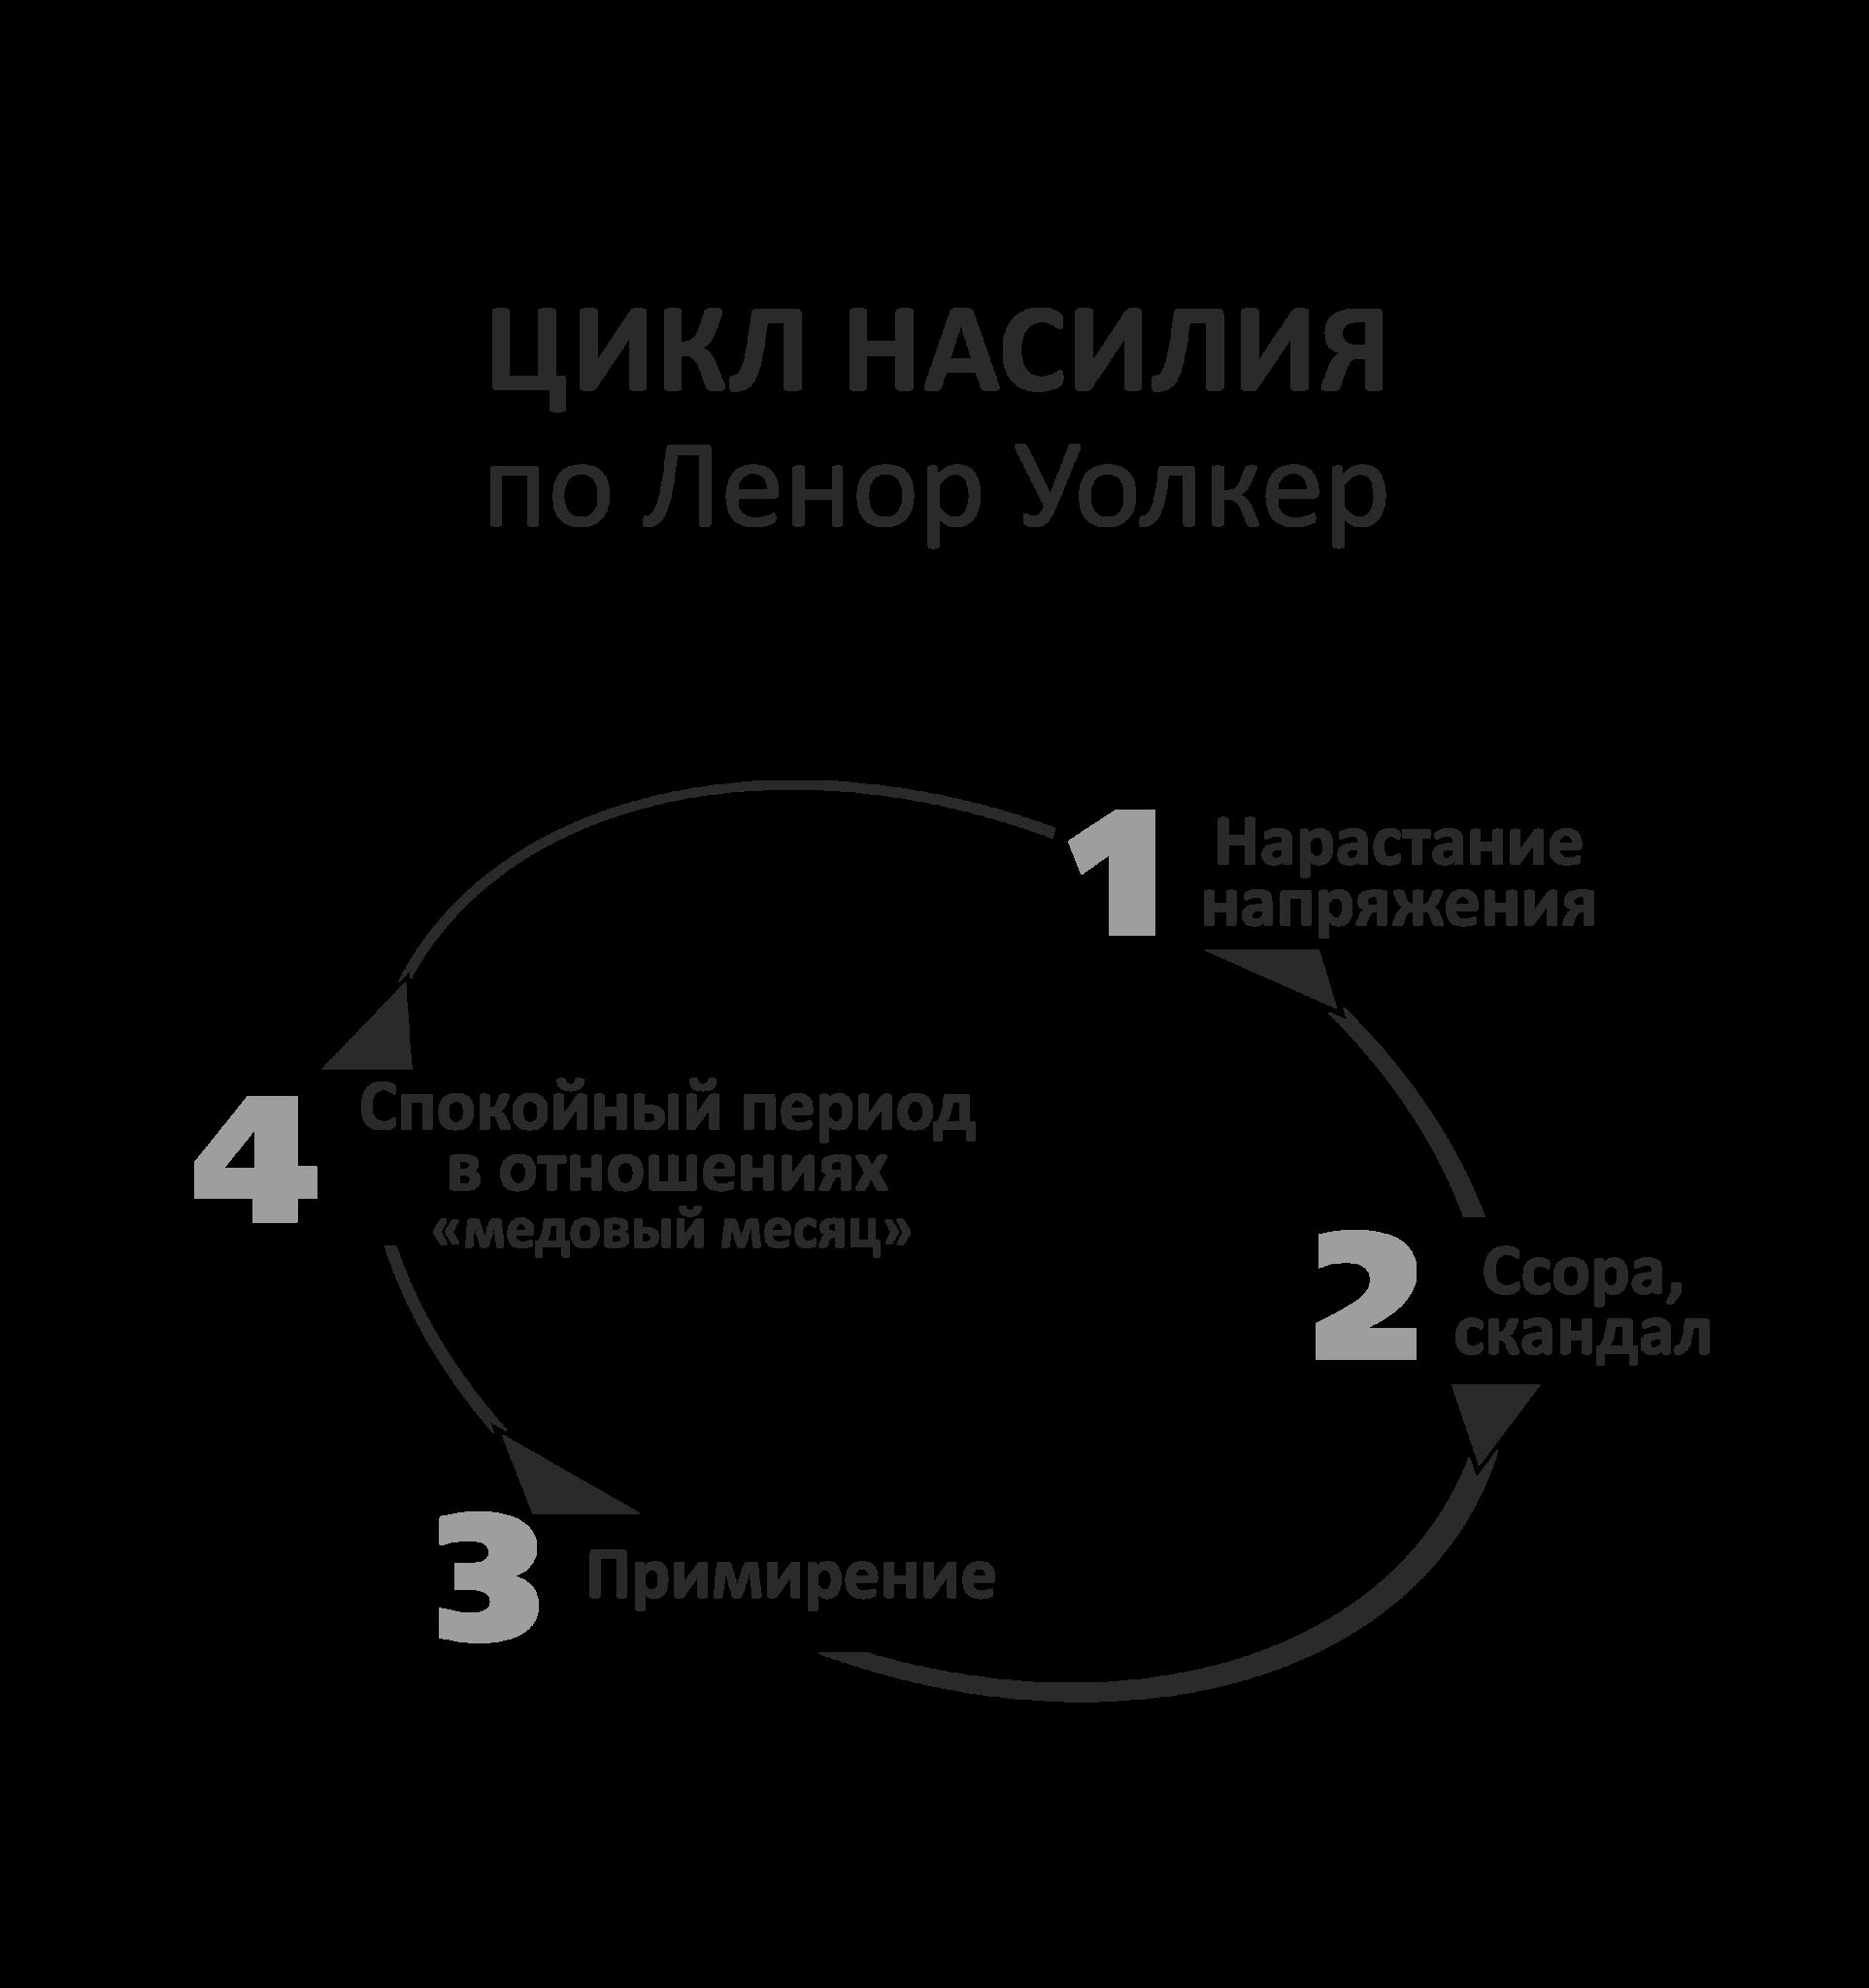 Цикл насилия поЛенор Уолкер